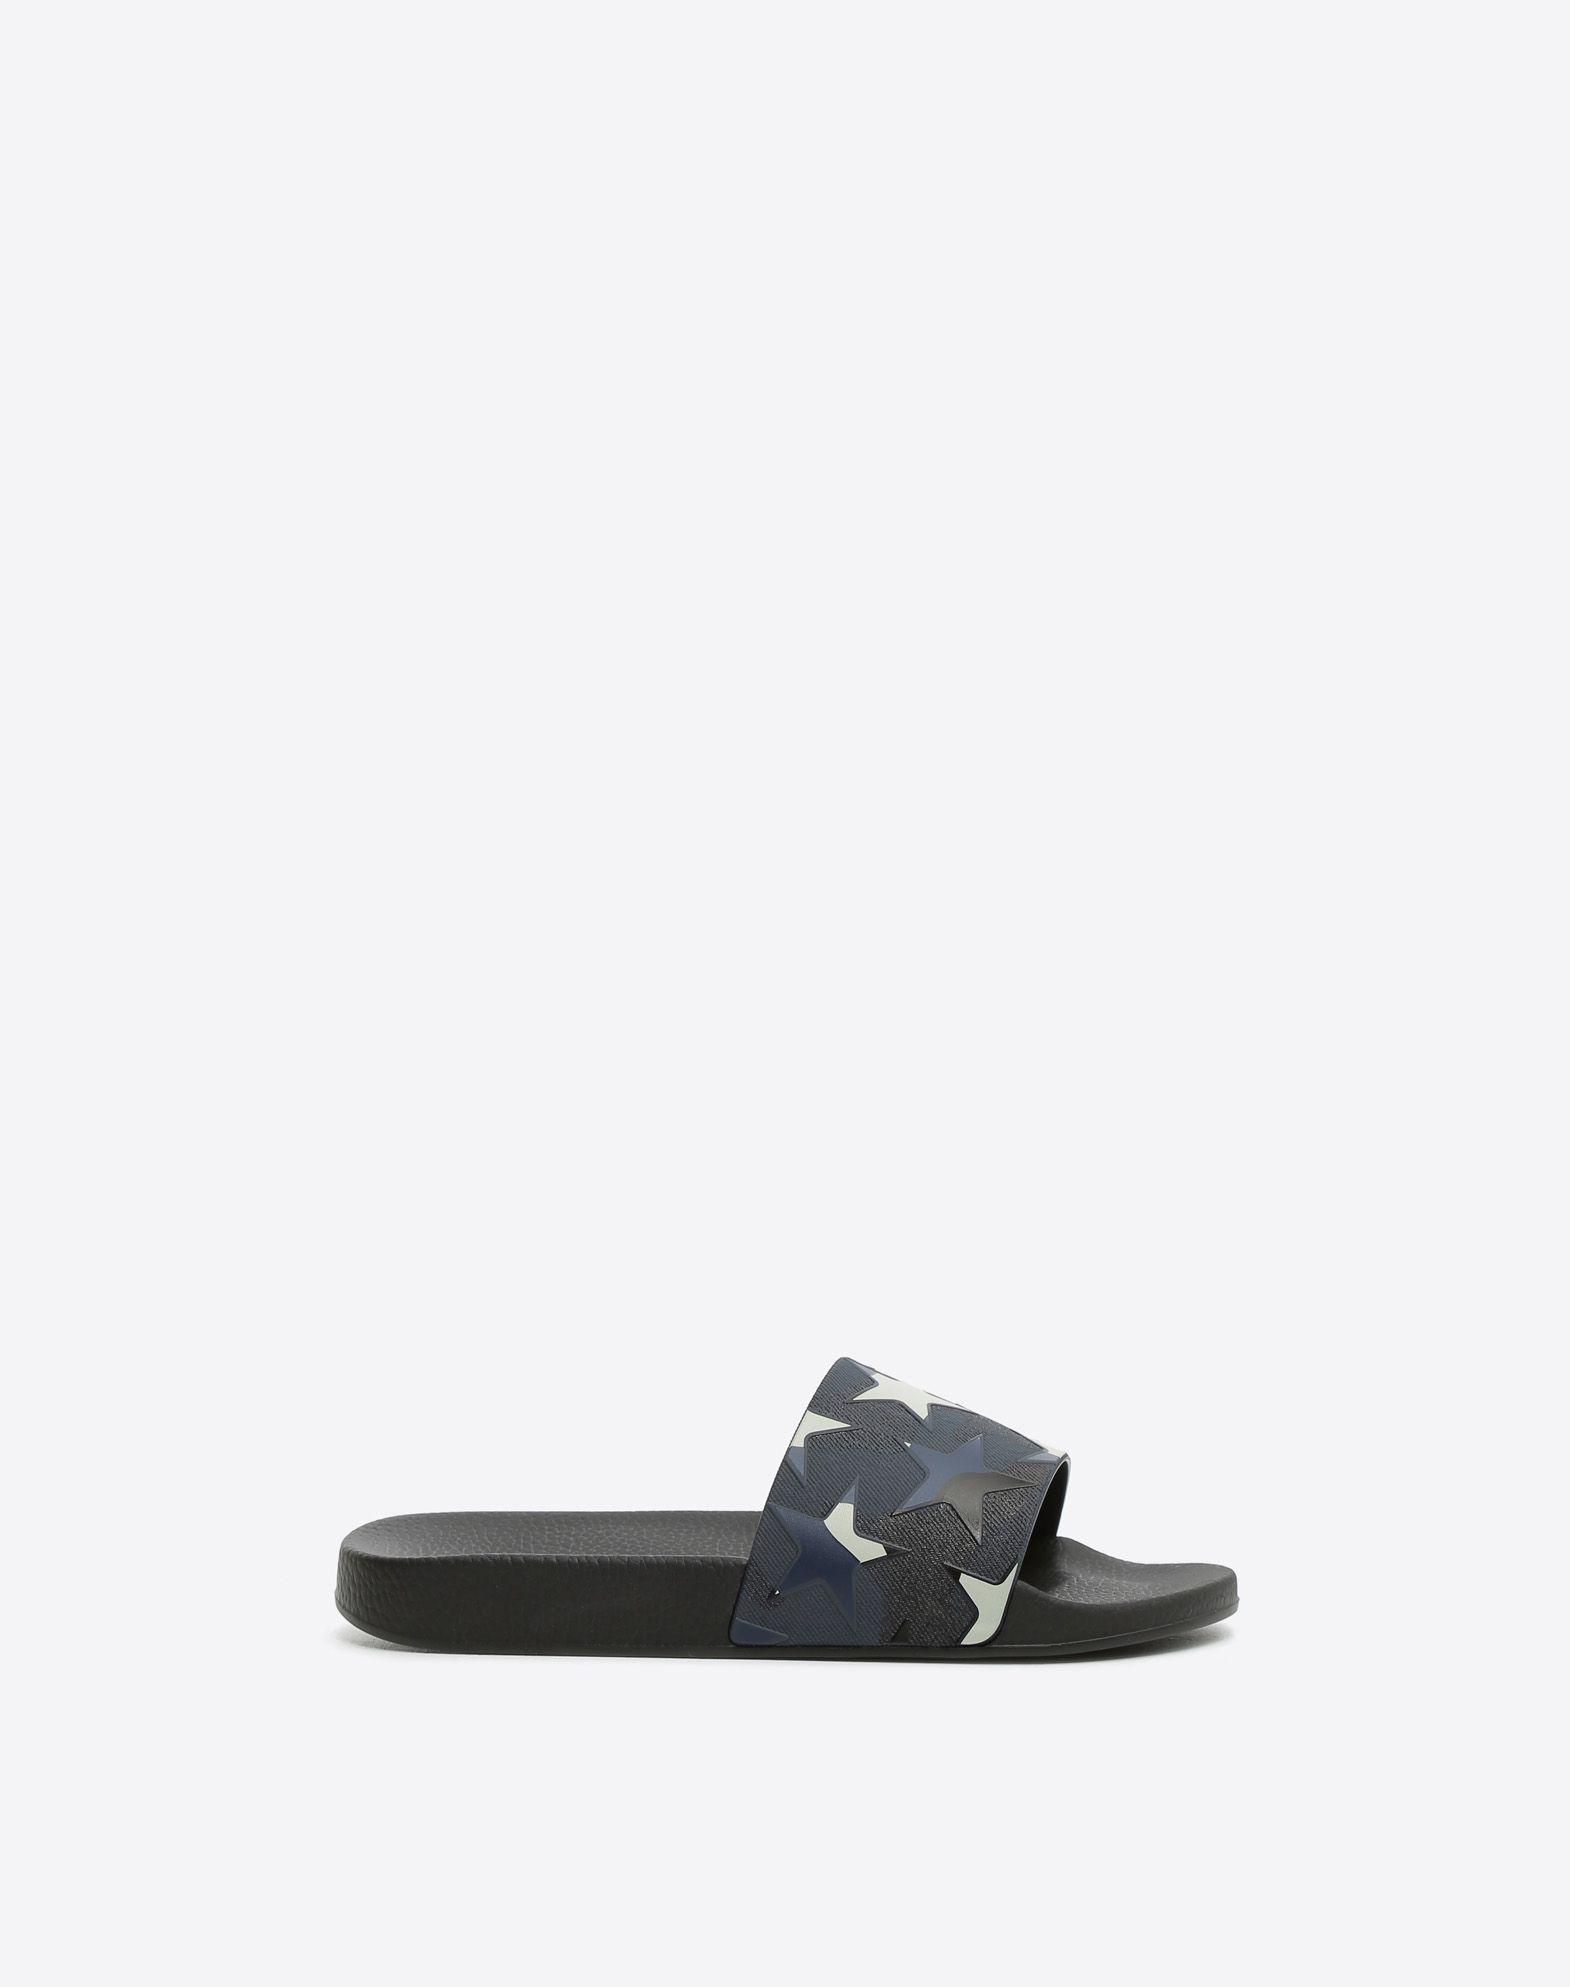 VALENTINO Print Round toeline Rubber sole  45350463ns